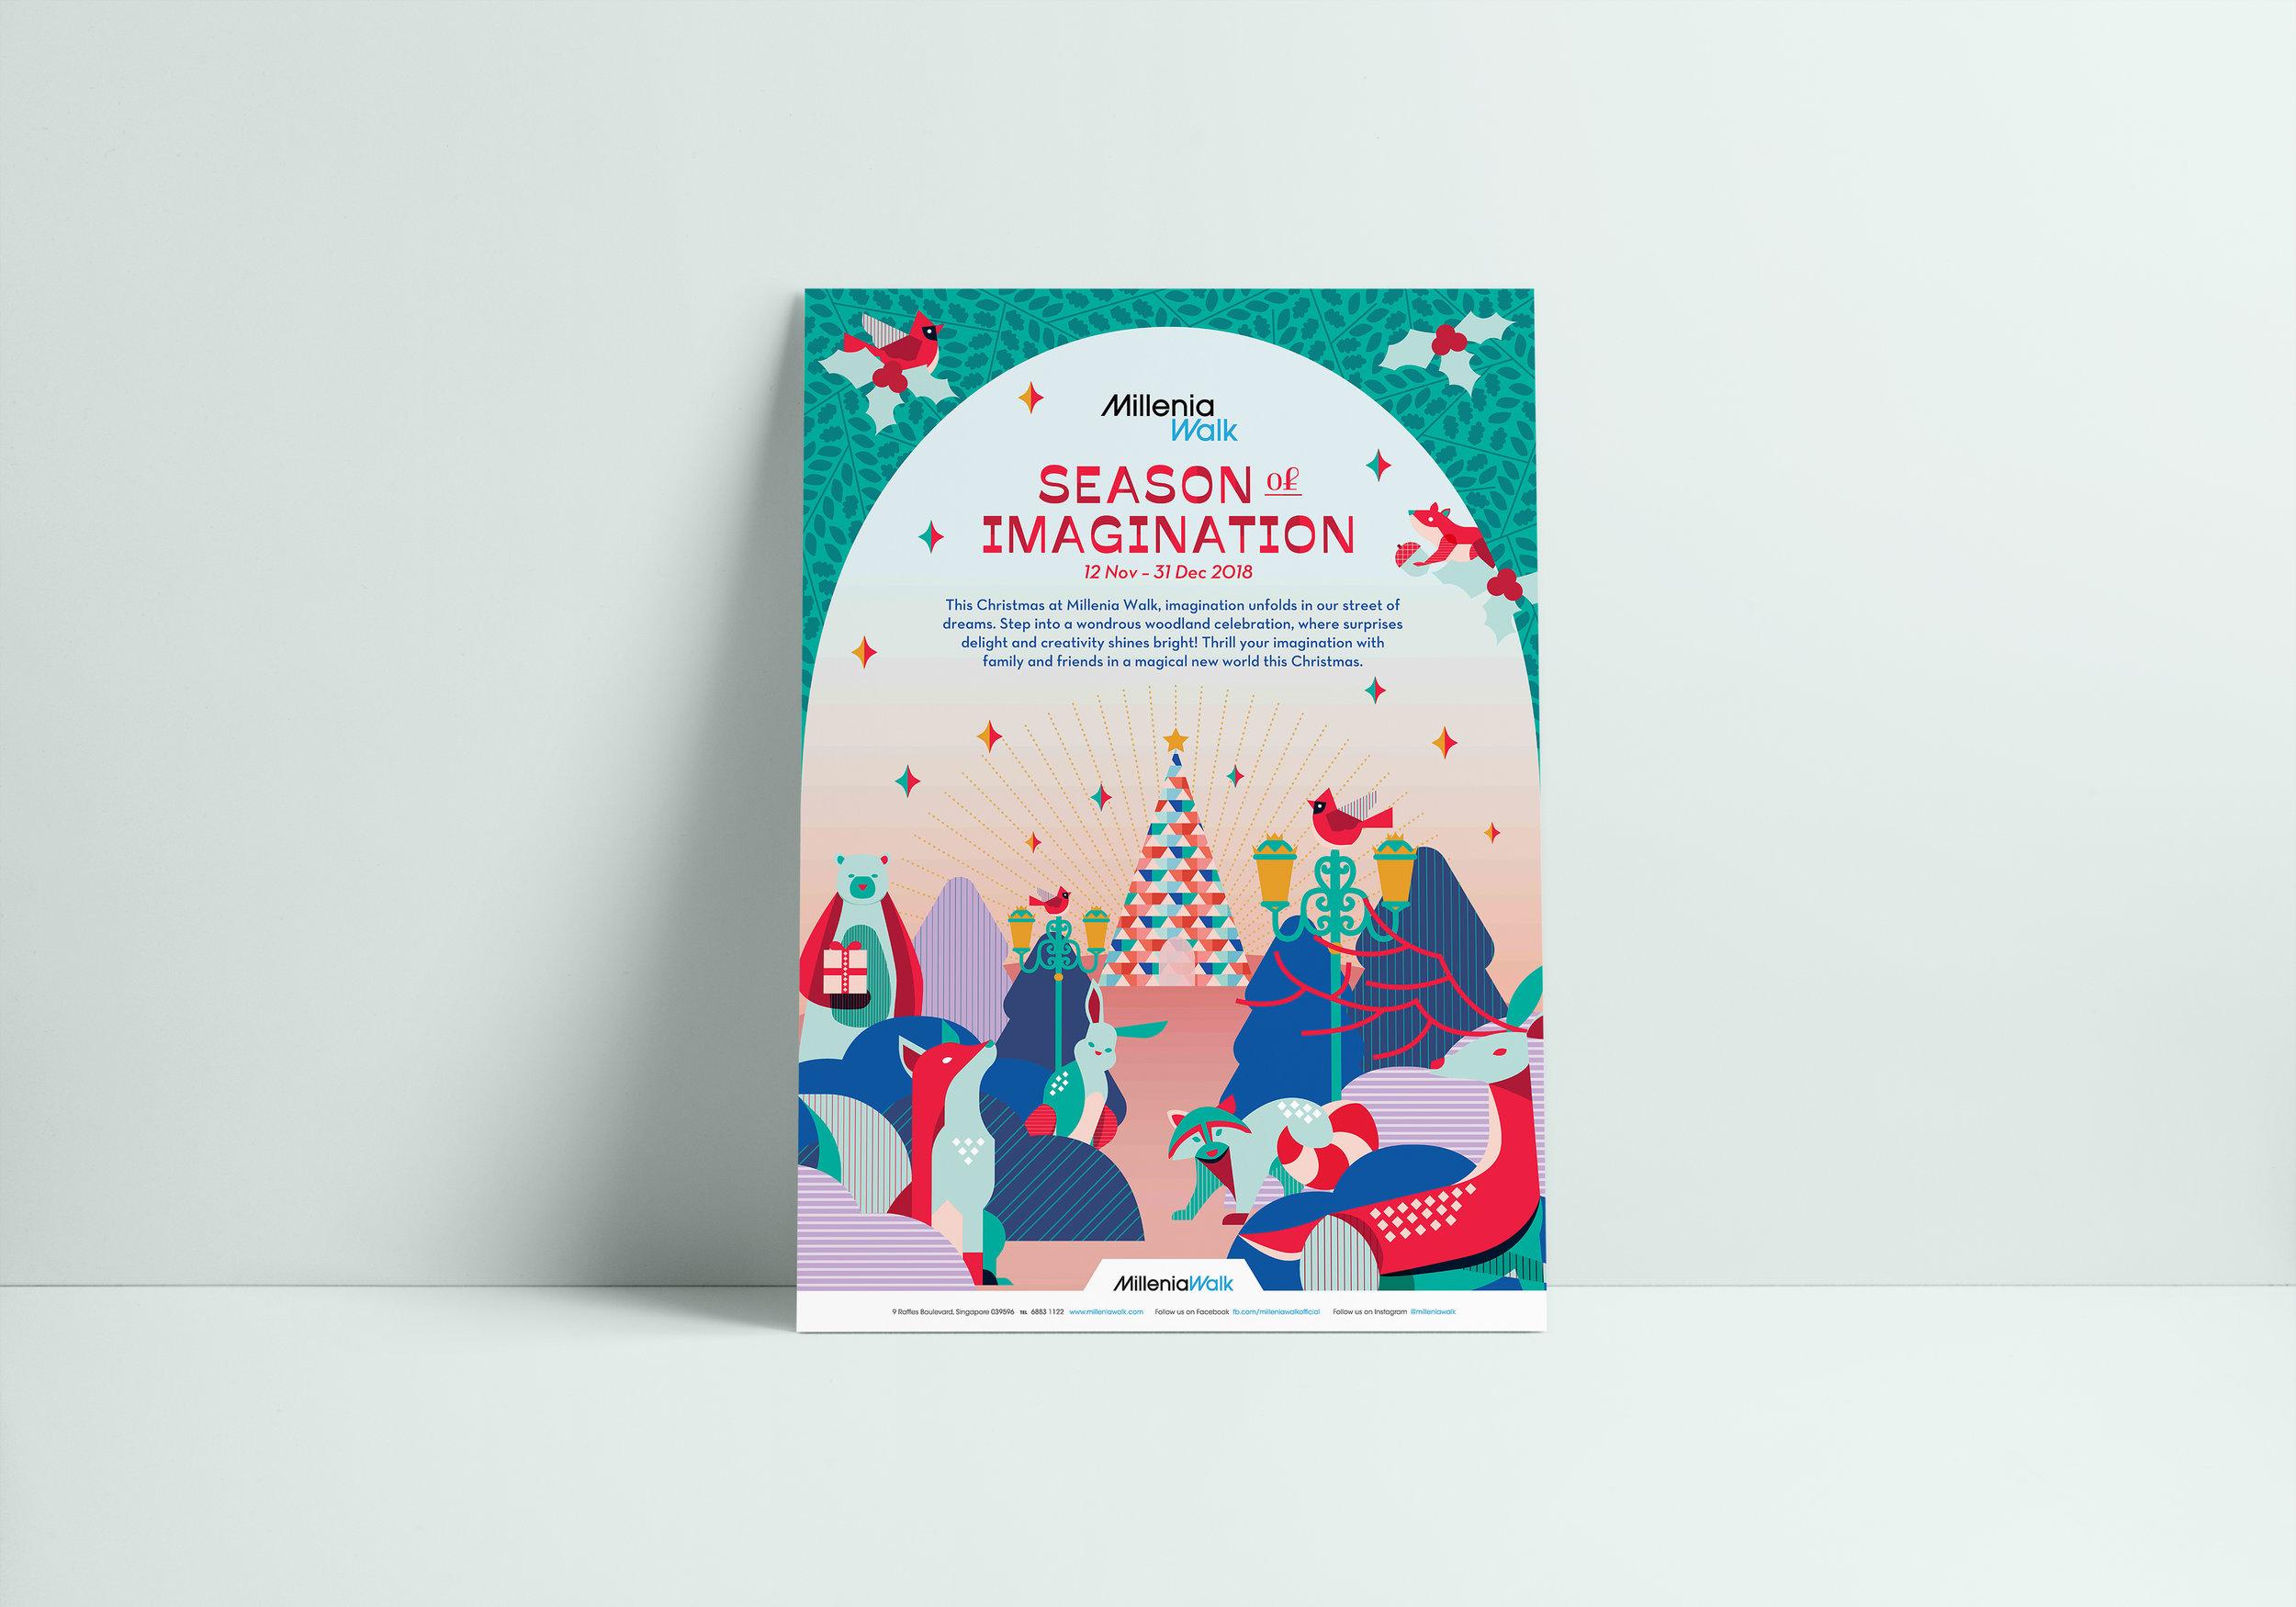 outeredit - millenia walk season of imagination - christmas key visual